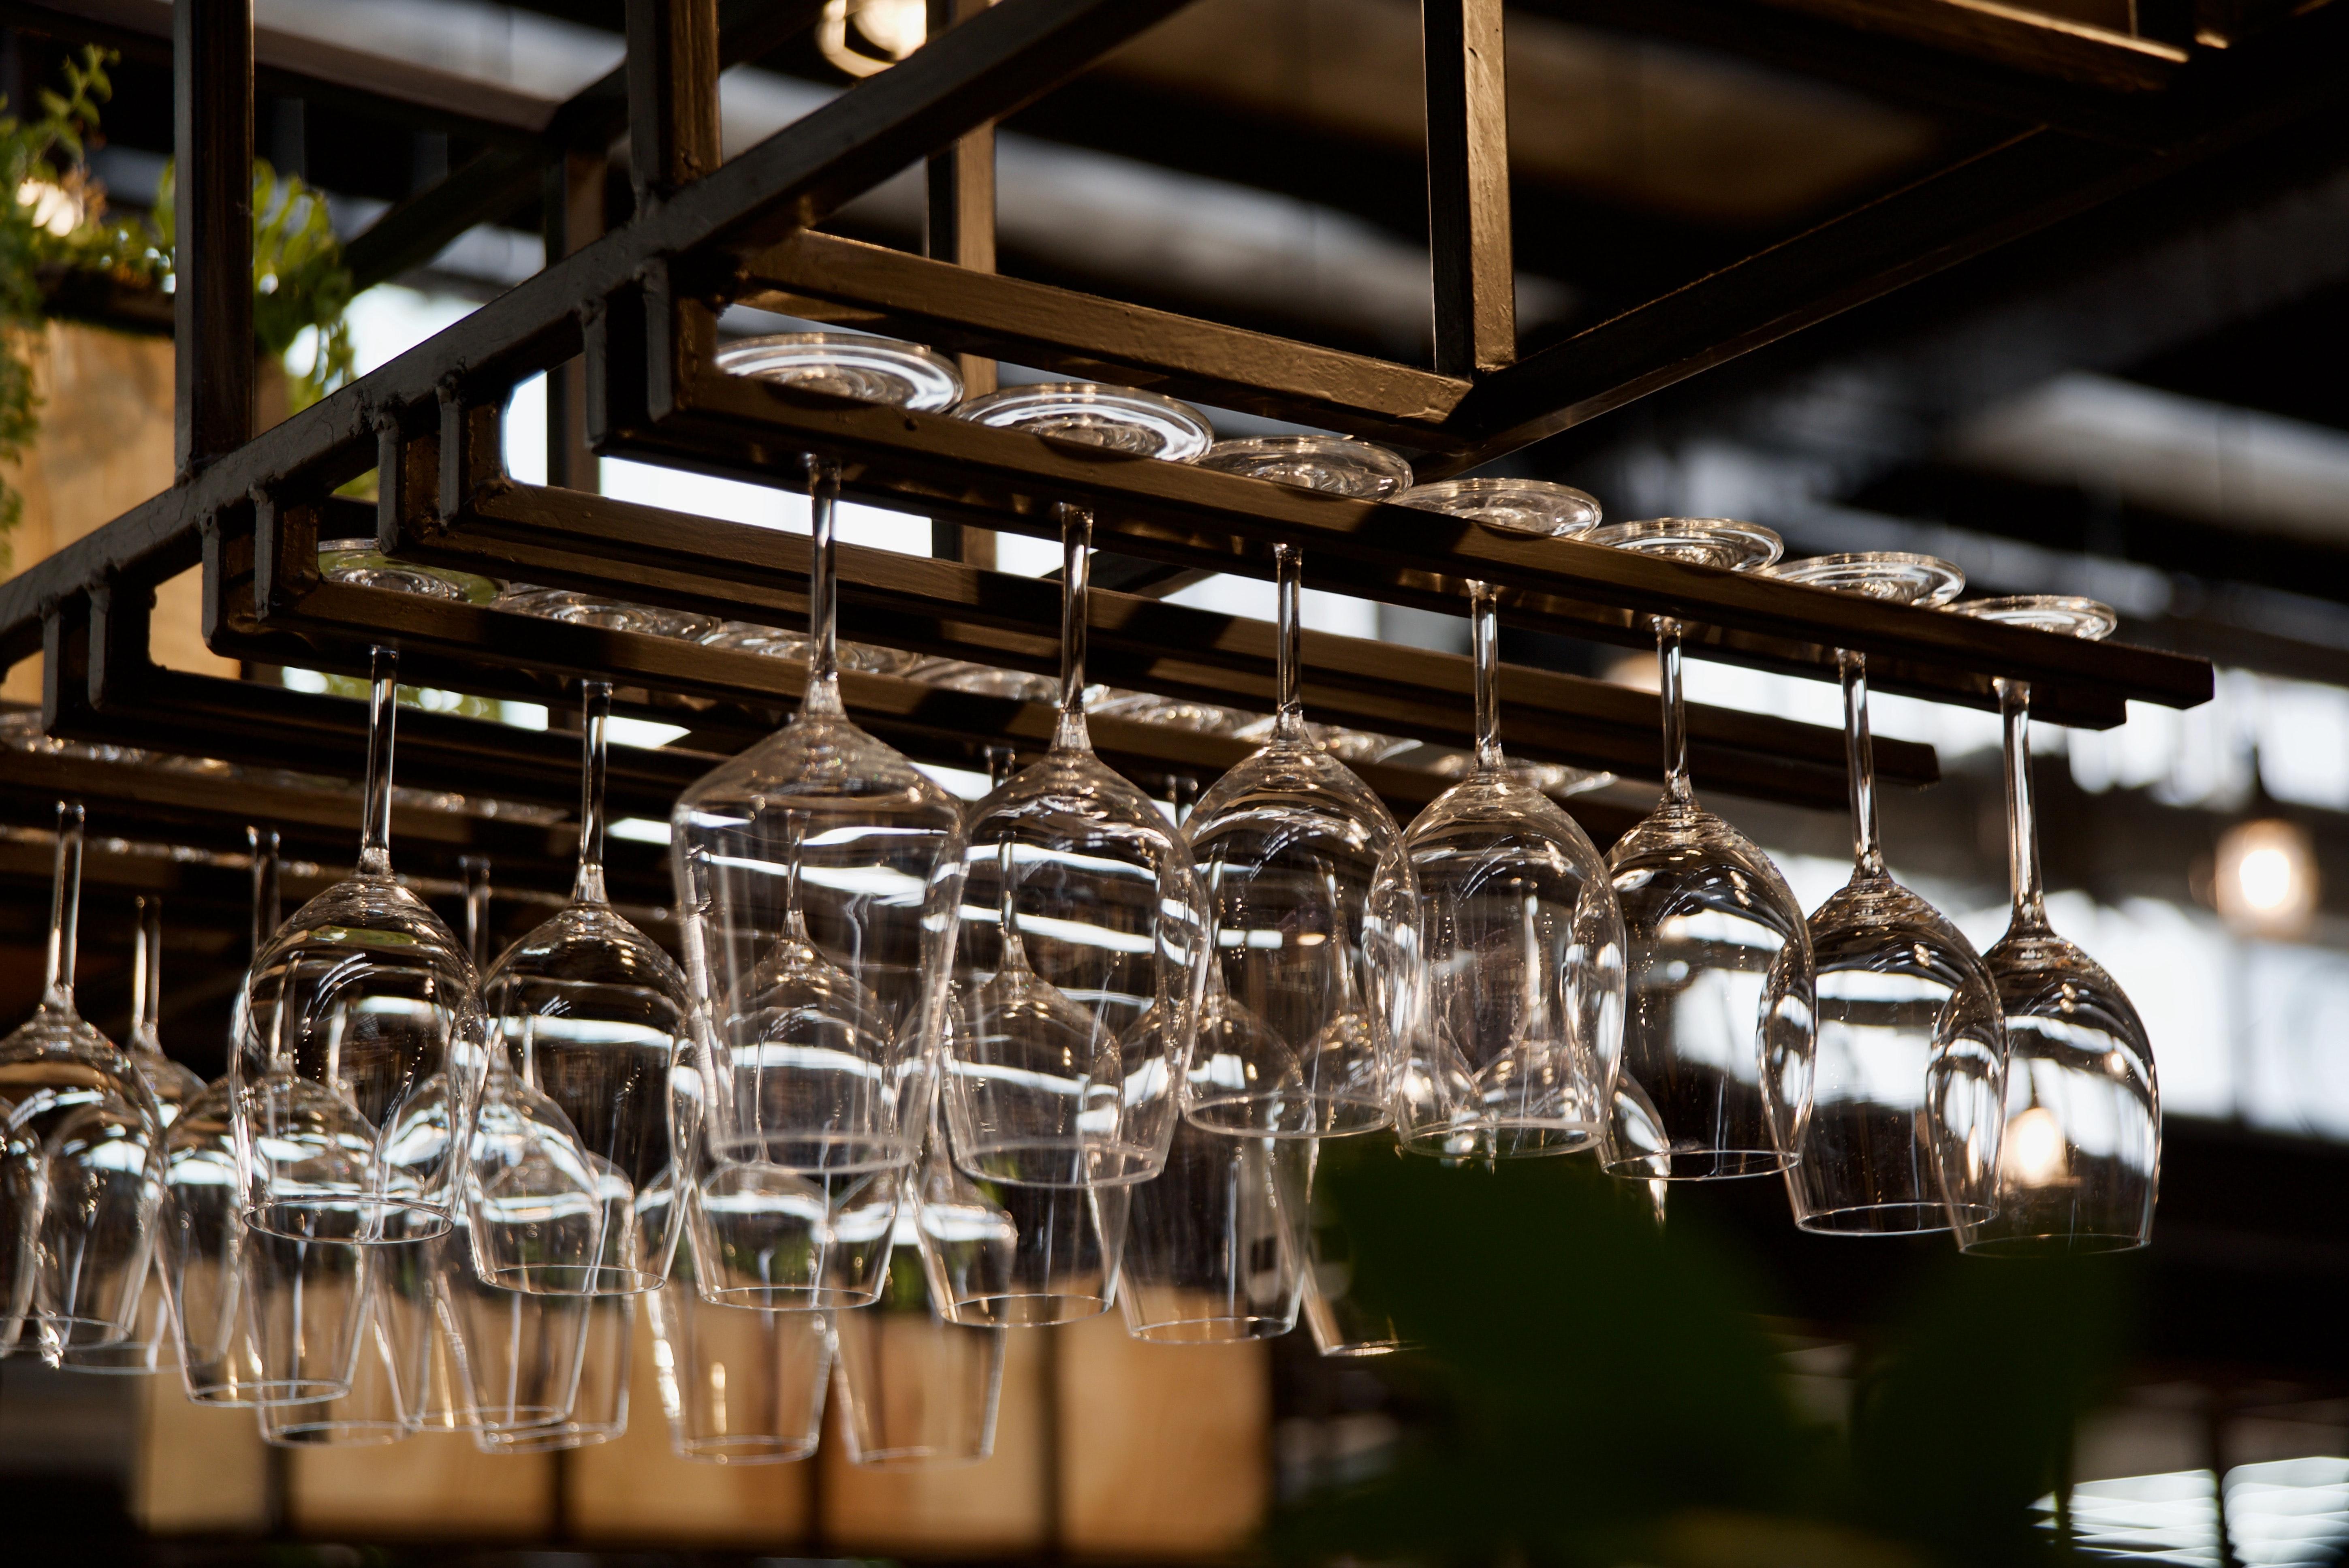 An overhead glass rack of wine glasses.